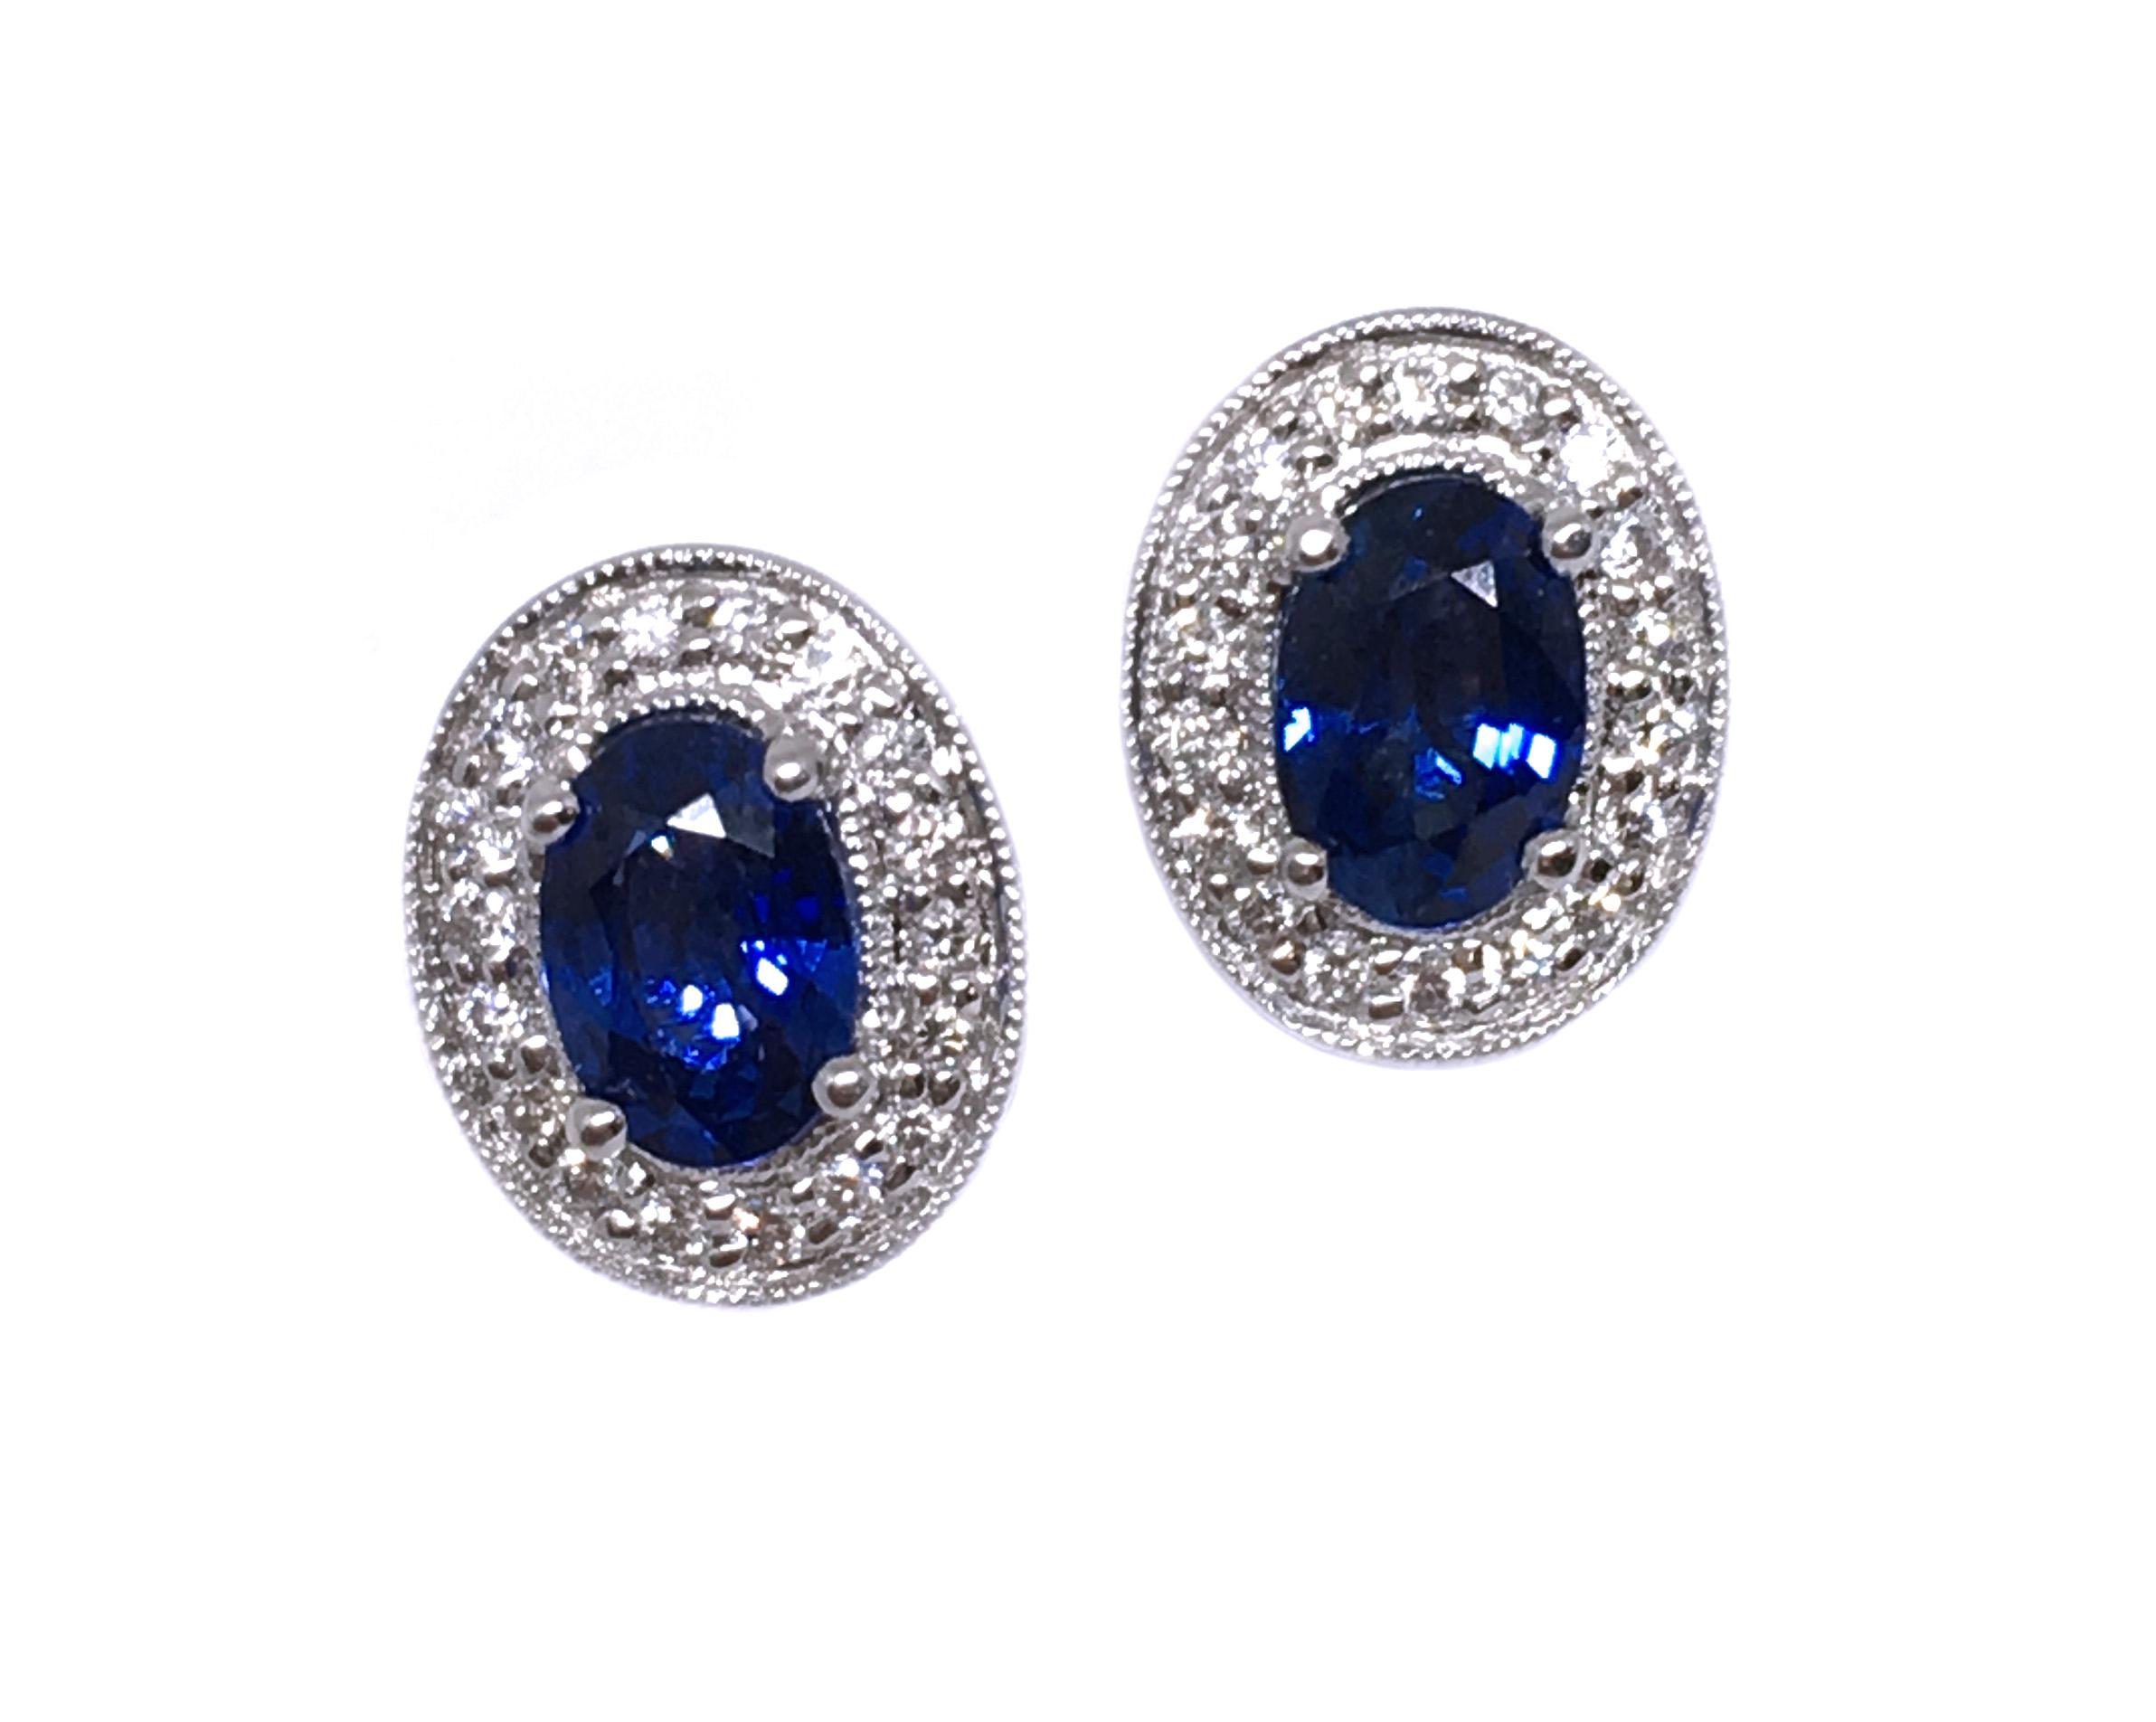 White Gold Sapphire & Diamond Earrings